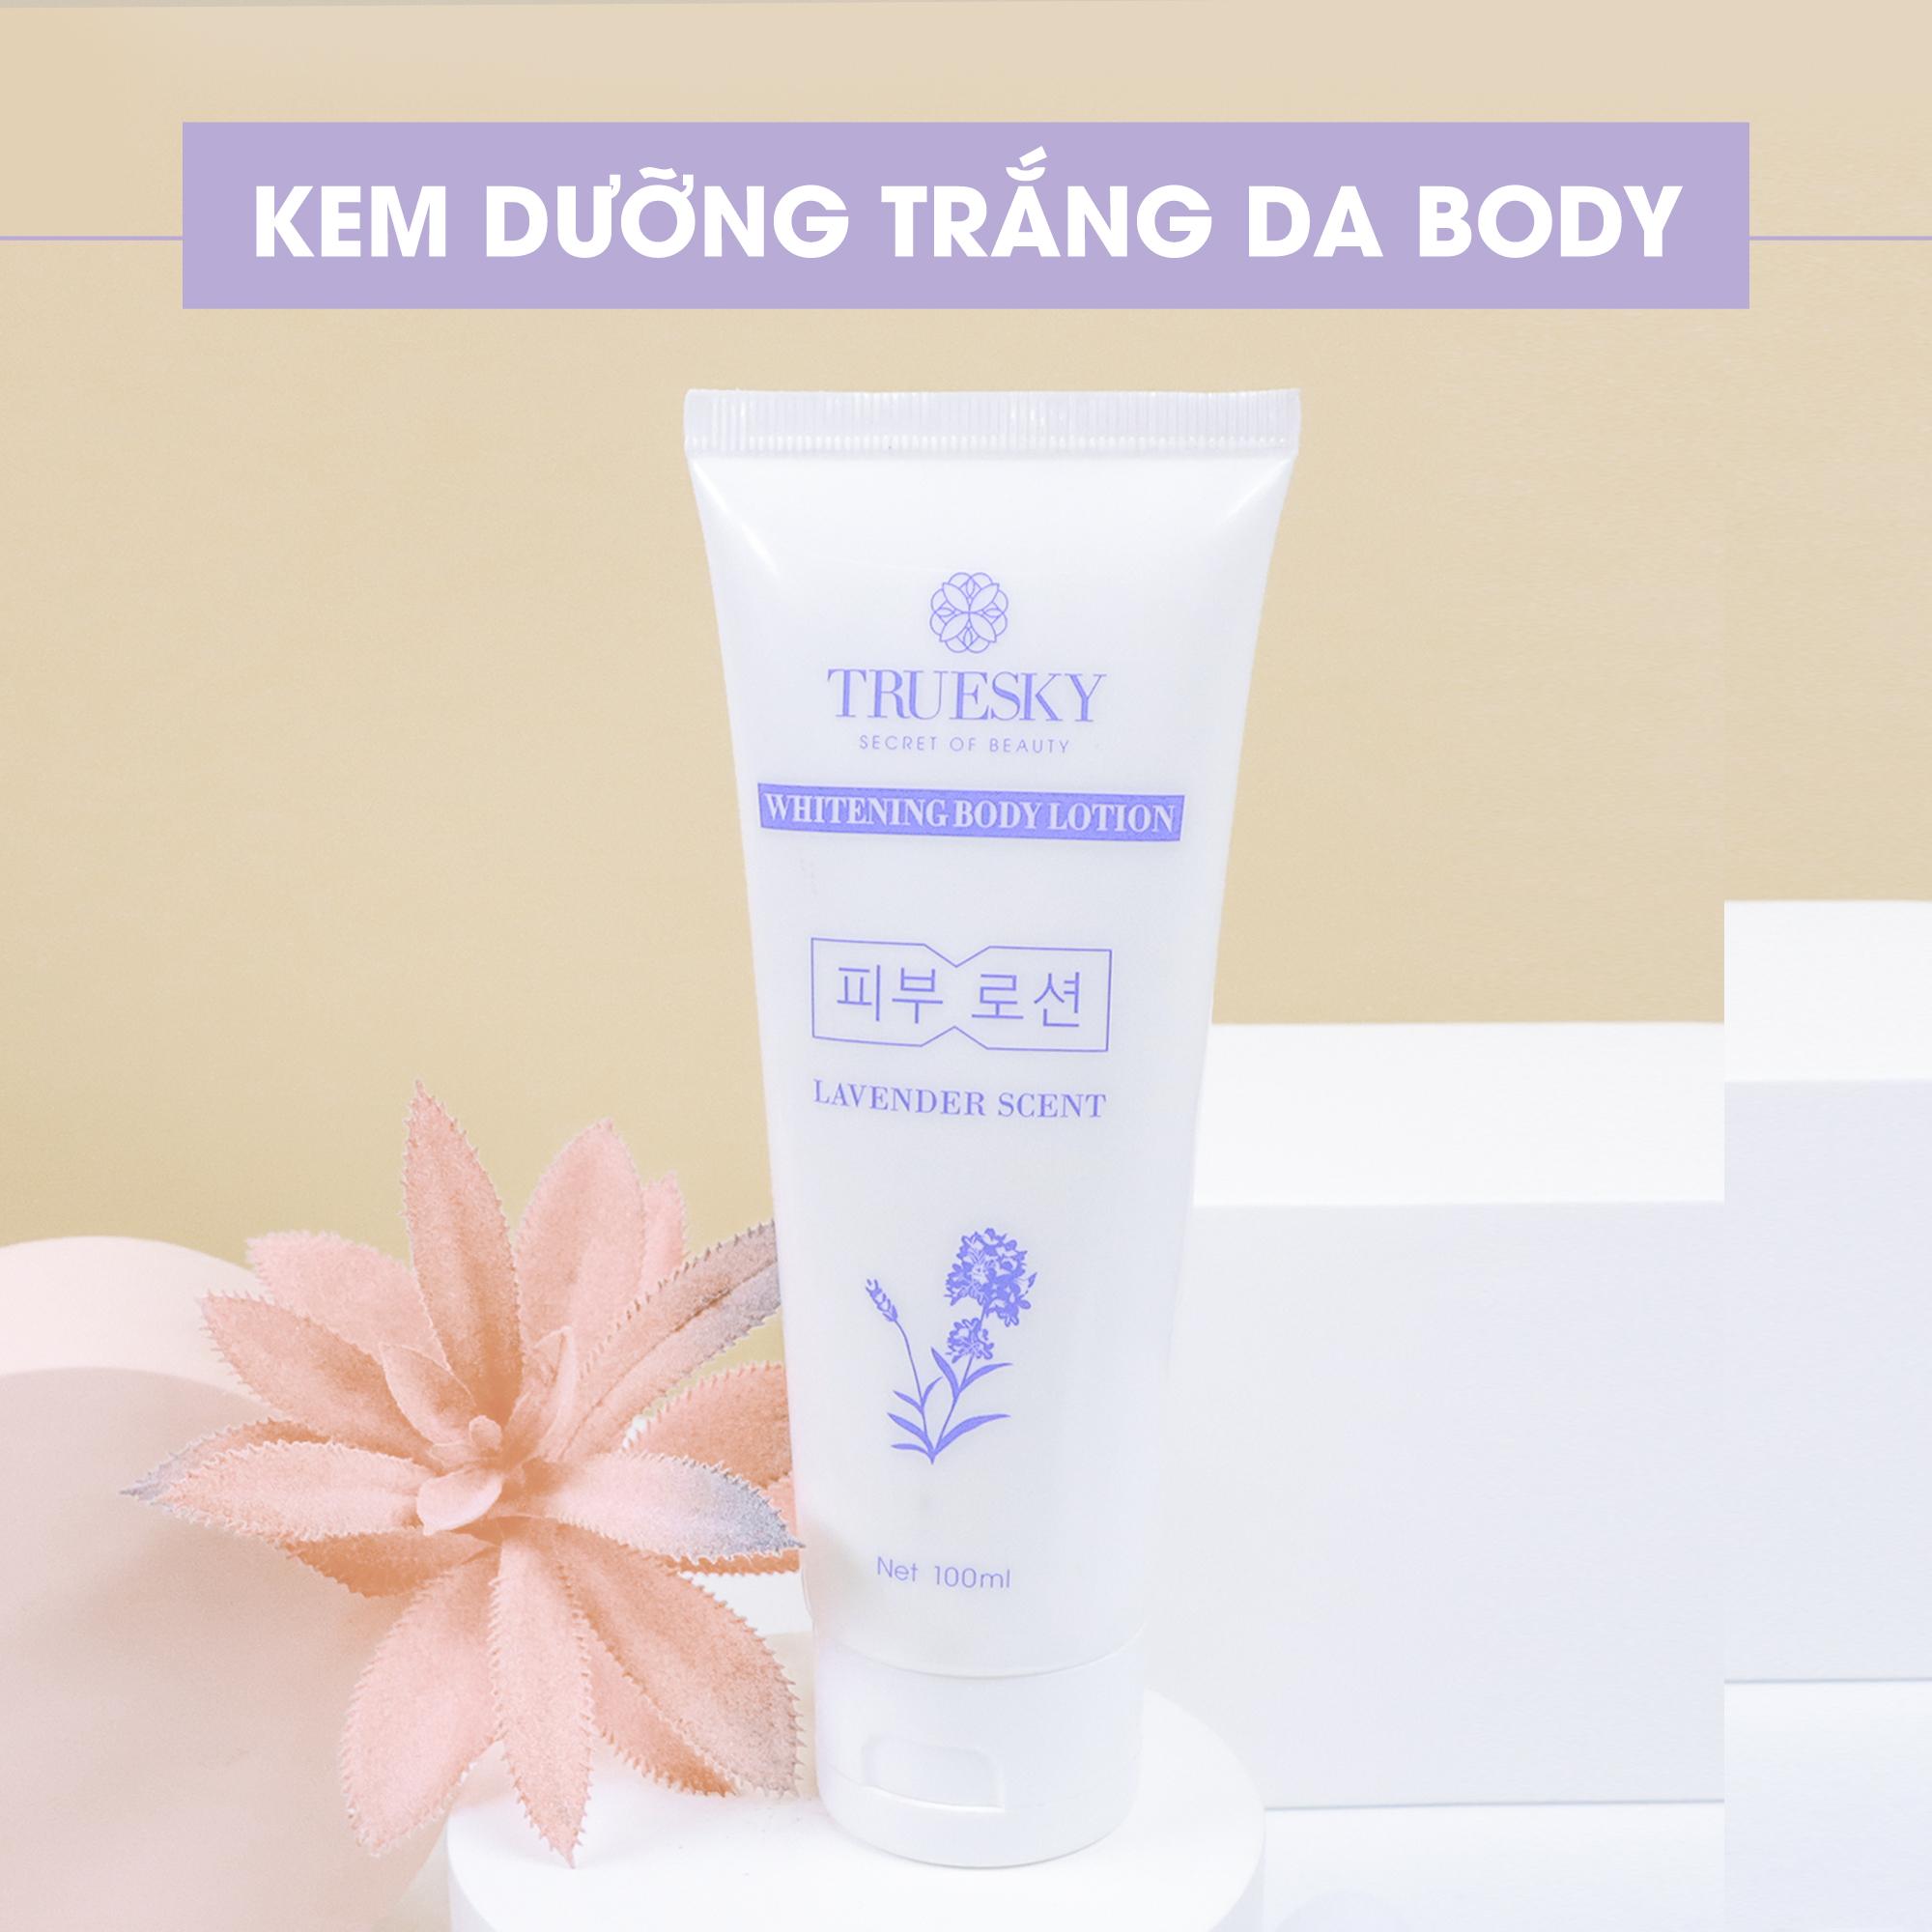 Bộ Truesky VIP06 gồm 1 kem ủ trắng body & 1 kem trắng da mặt & 1 sữa rửa mặt trắng da & 1 dưỡng trắng body Lavender